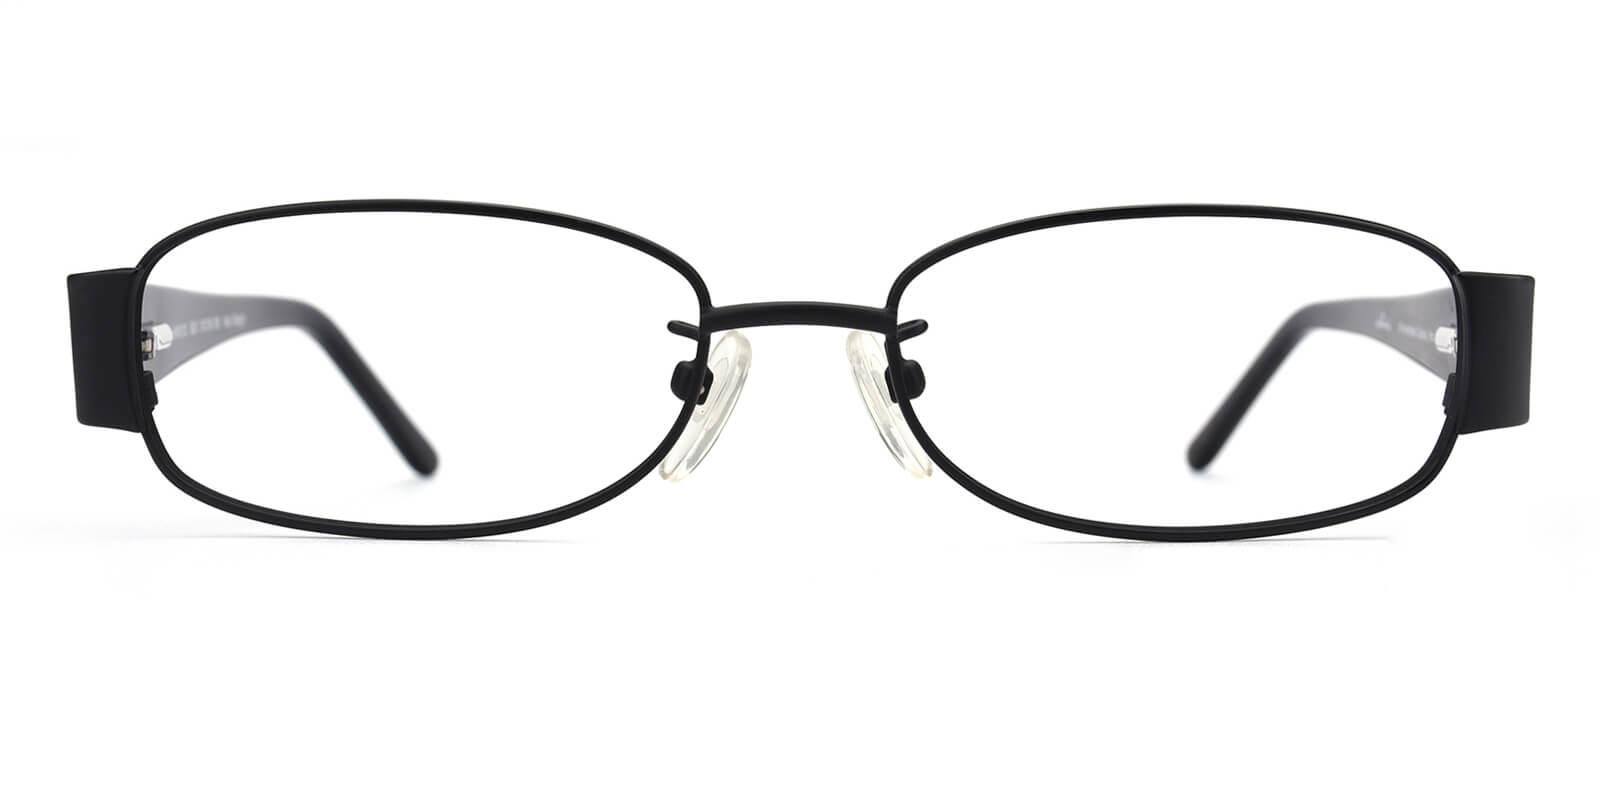 Janniey-Black-Rectangle-Metal-Eyeglasses-additional2